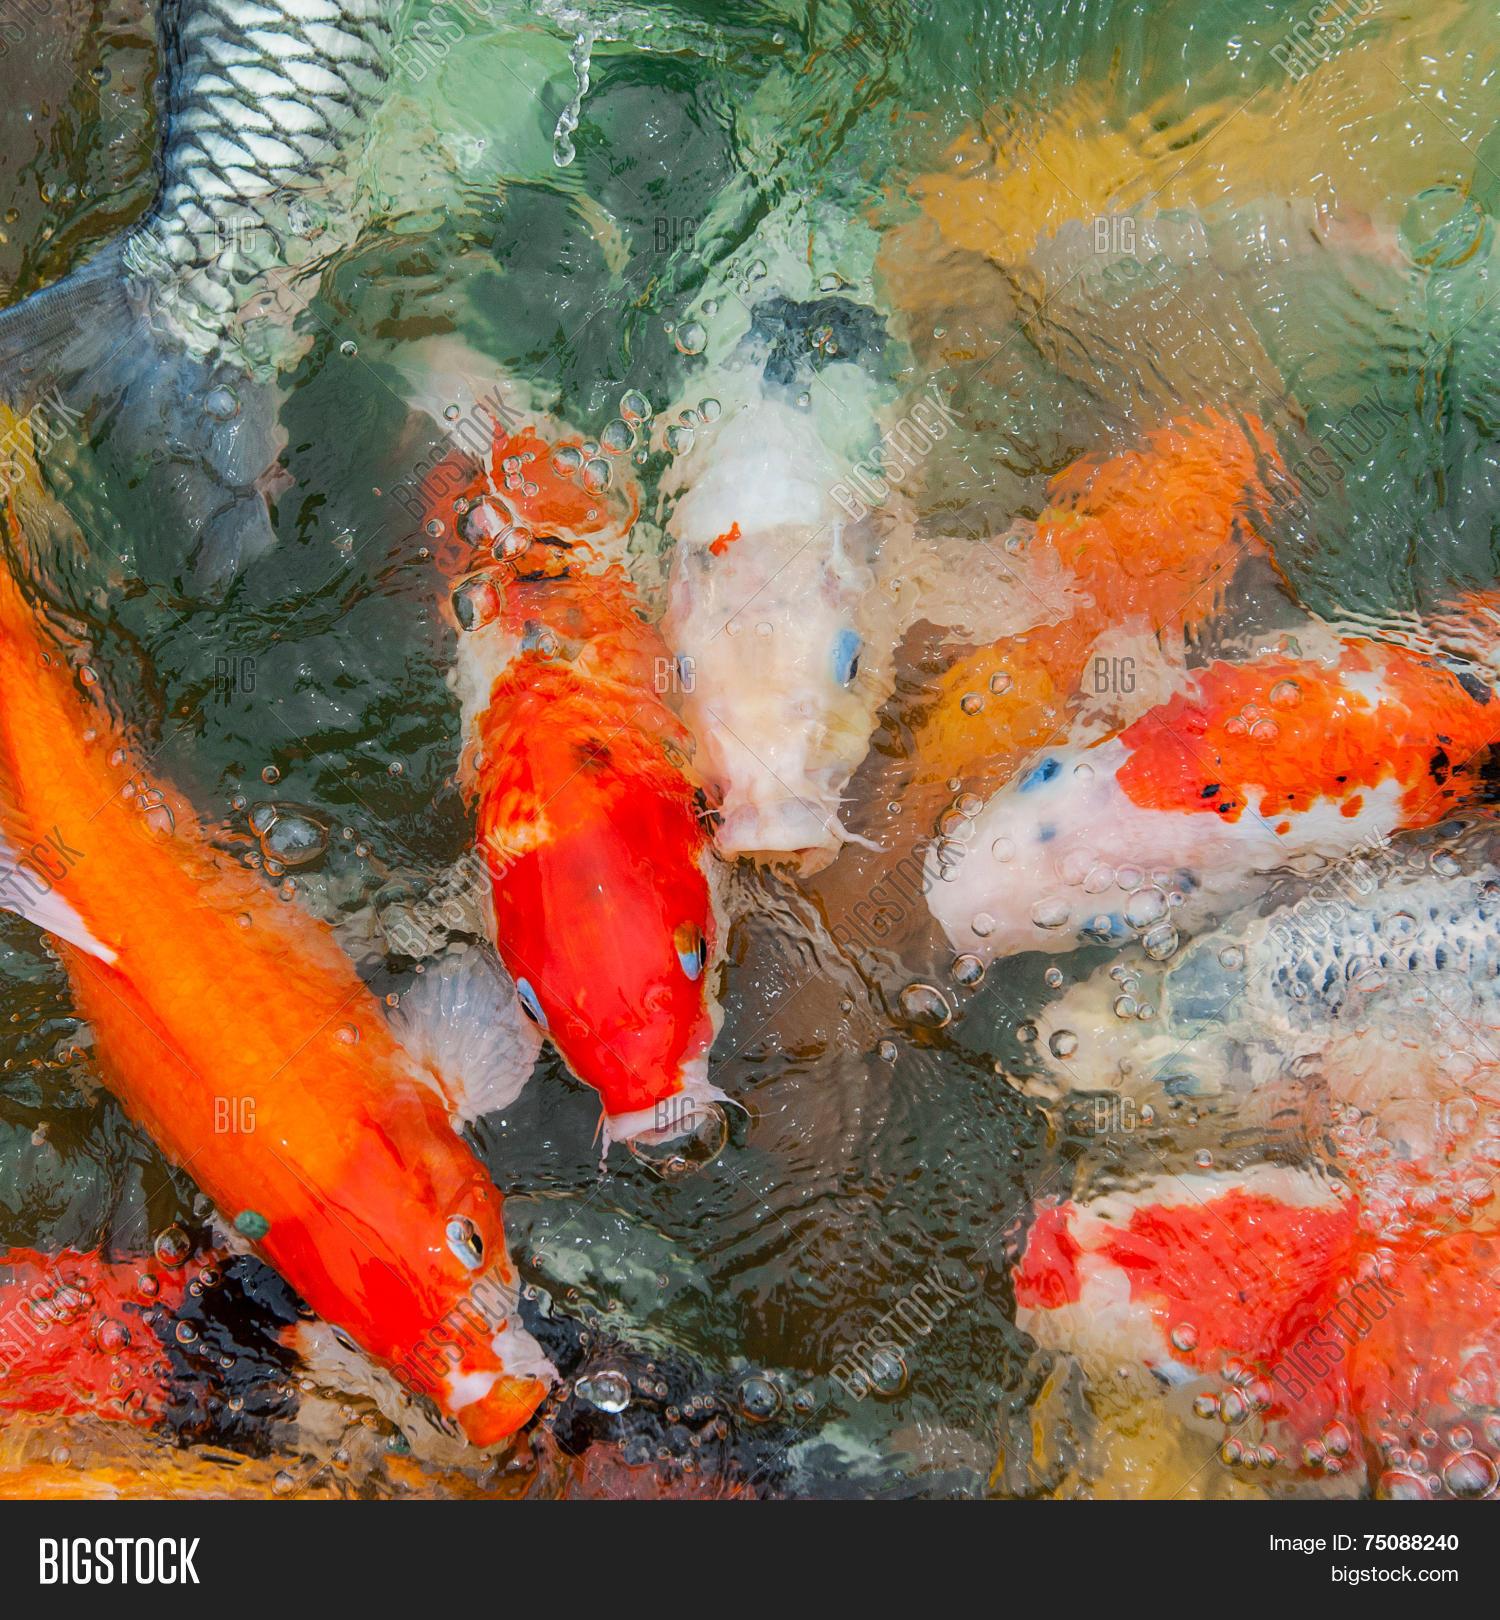 Colorful Koi Carp Image & Photo (Free Trial)   Bigstock